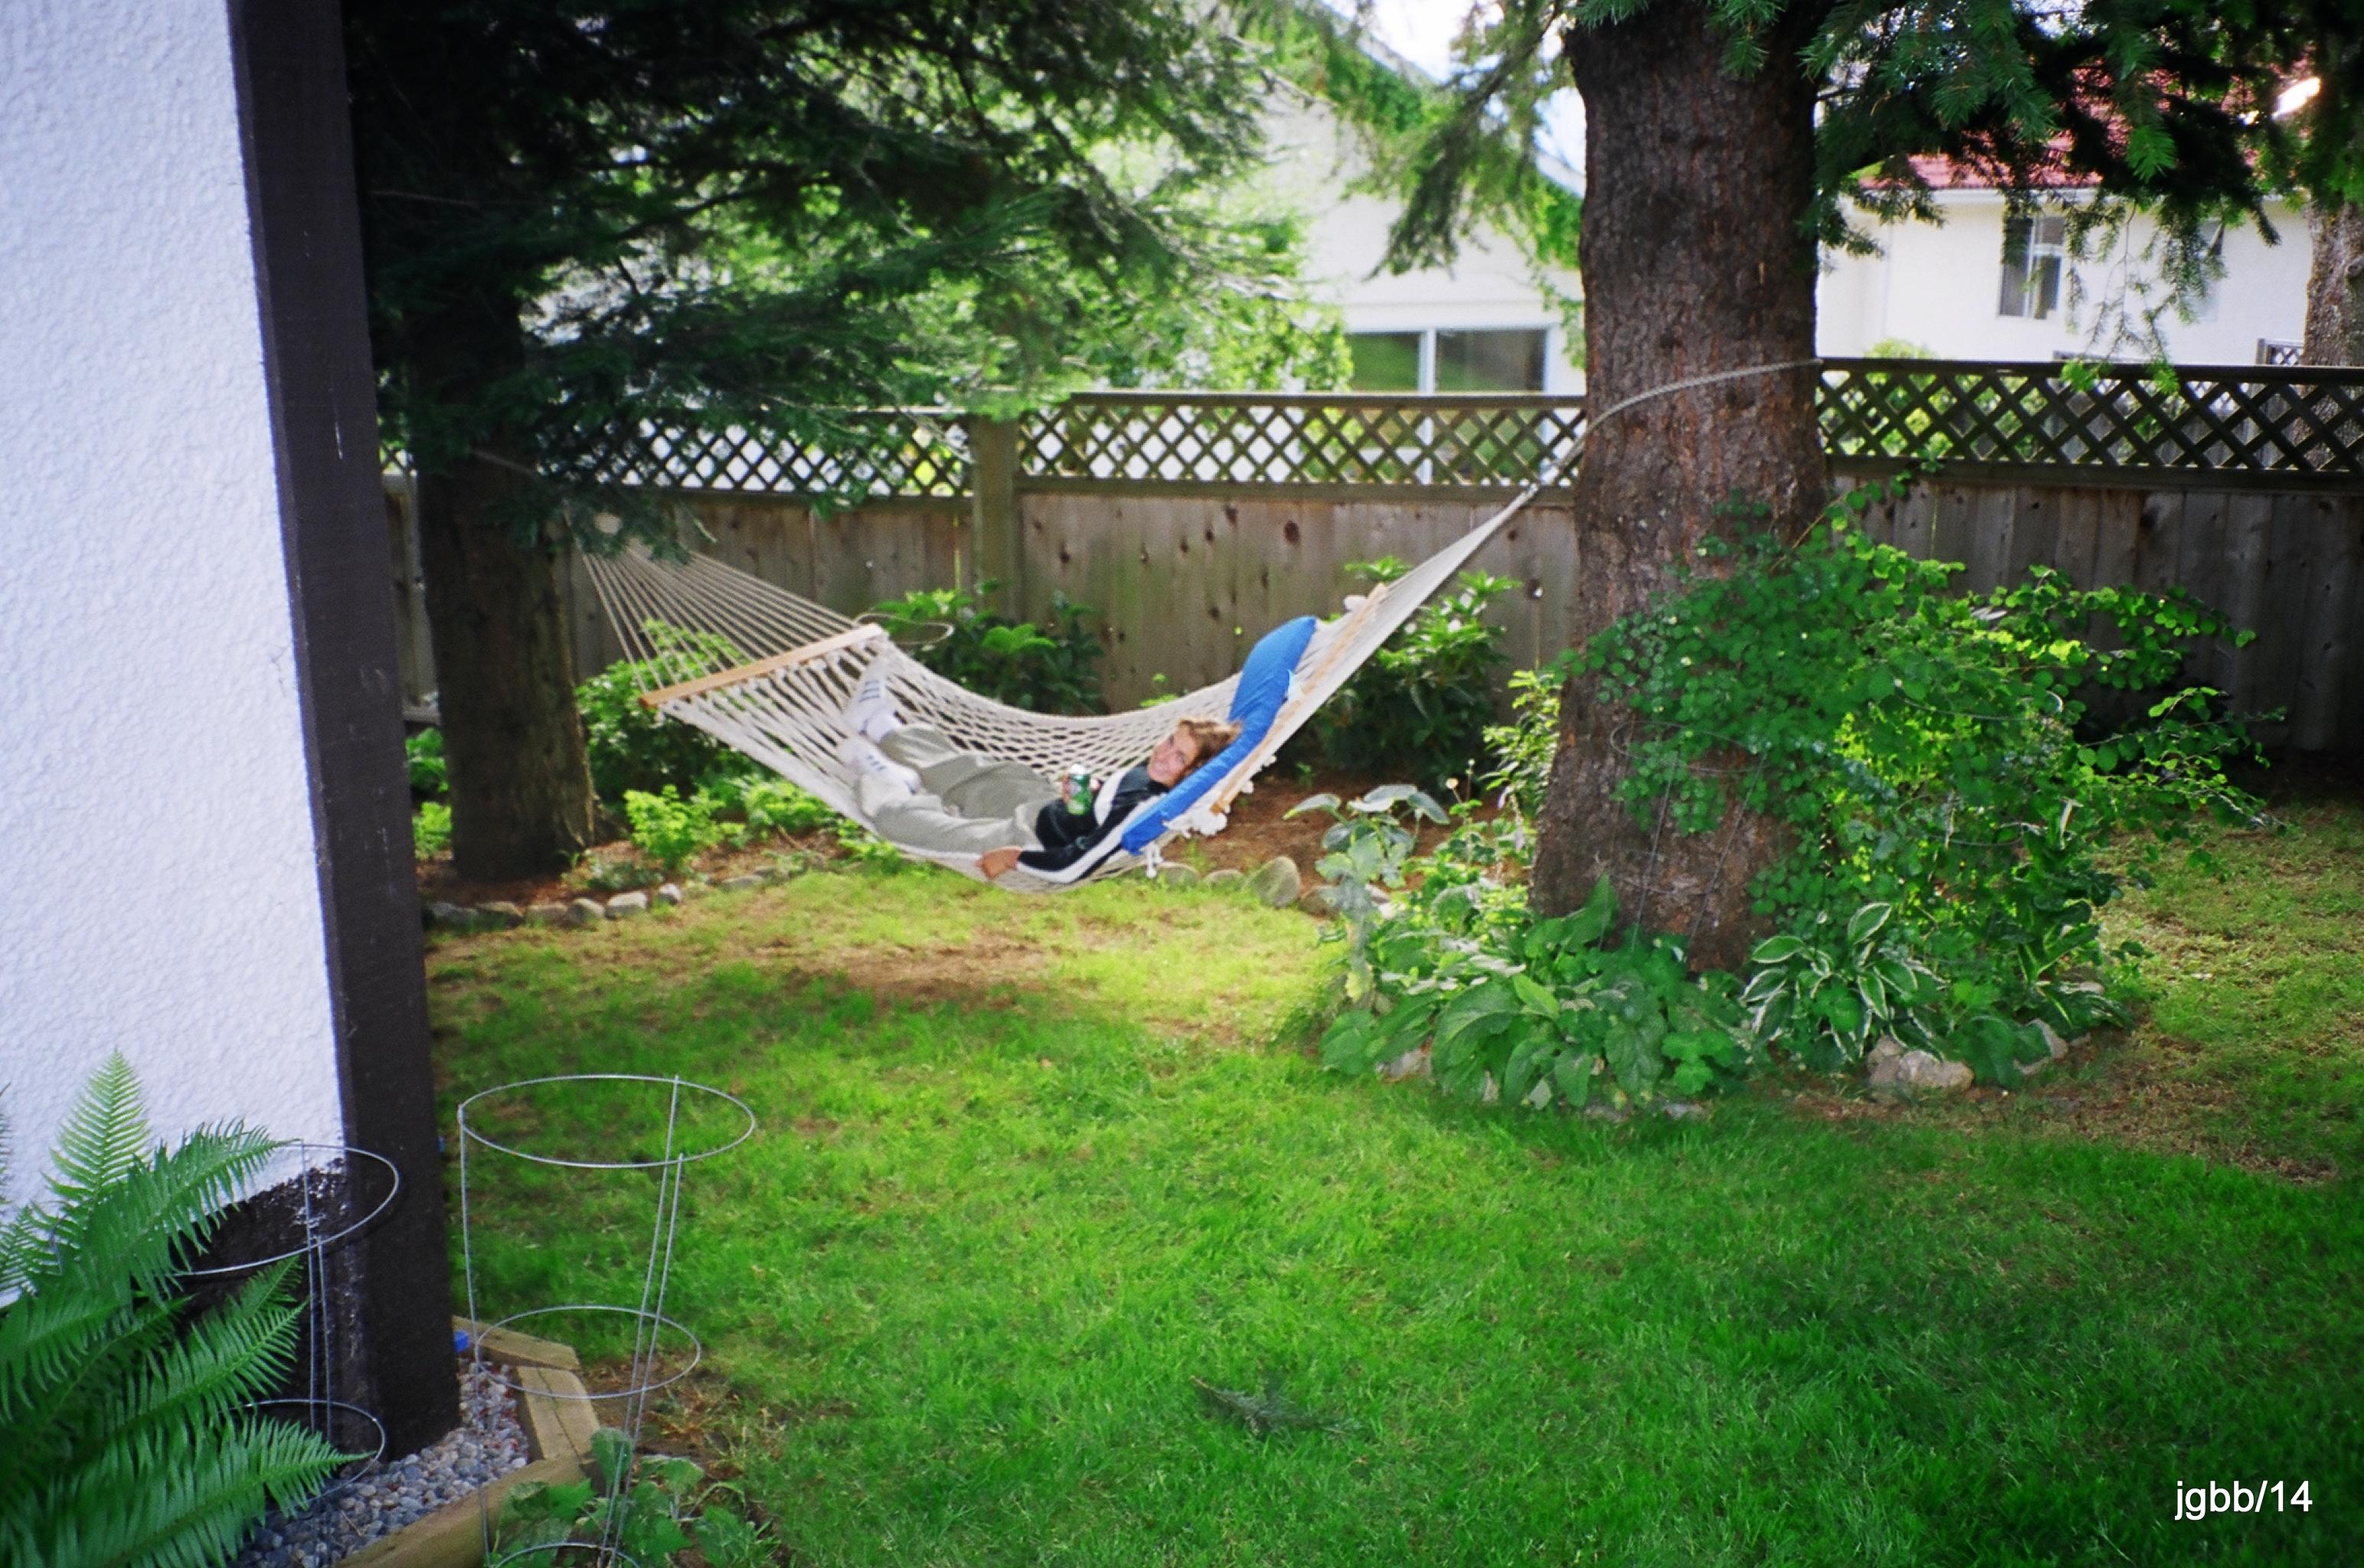 21-Allison, hammock 01810006_006_0001